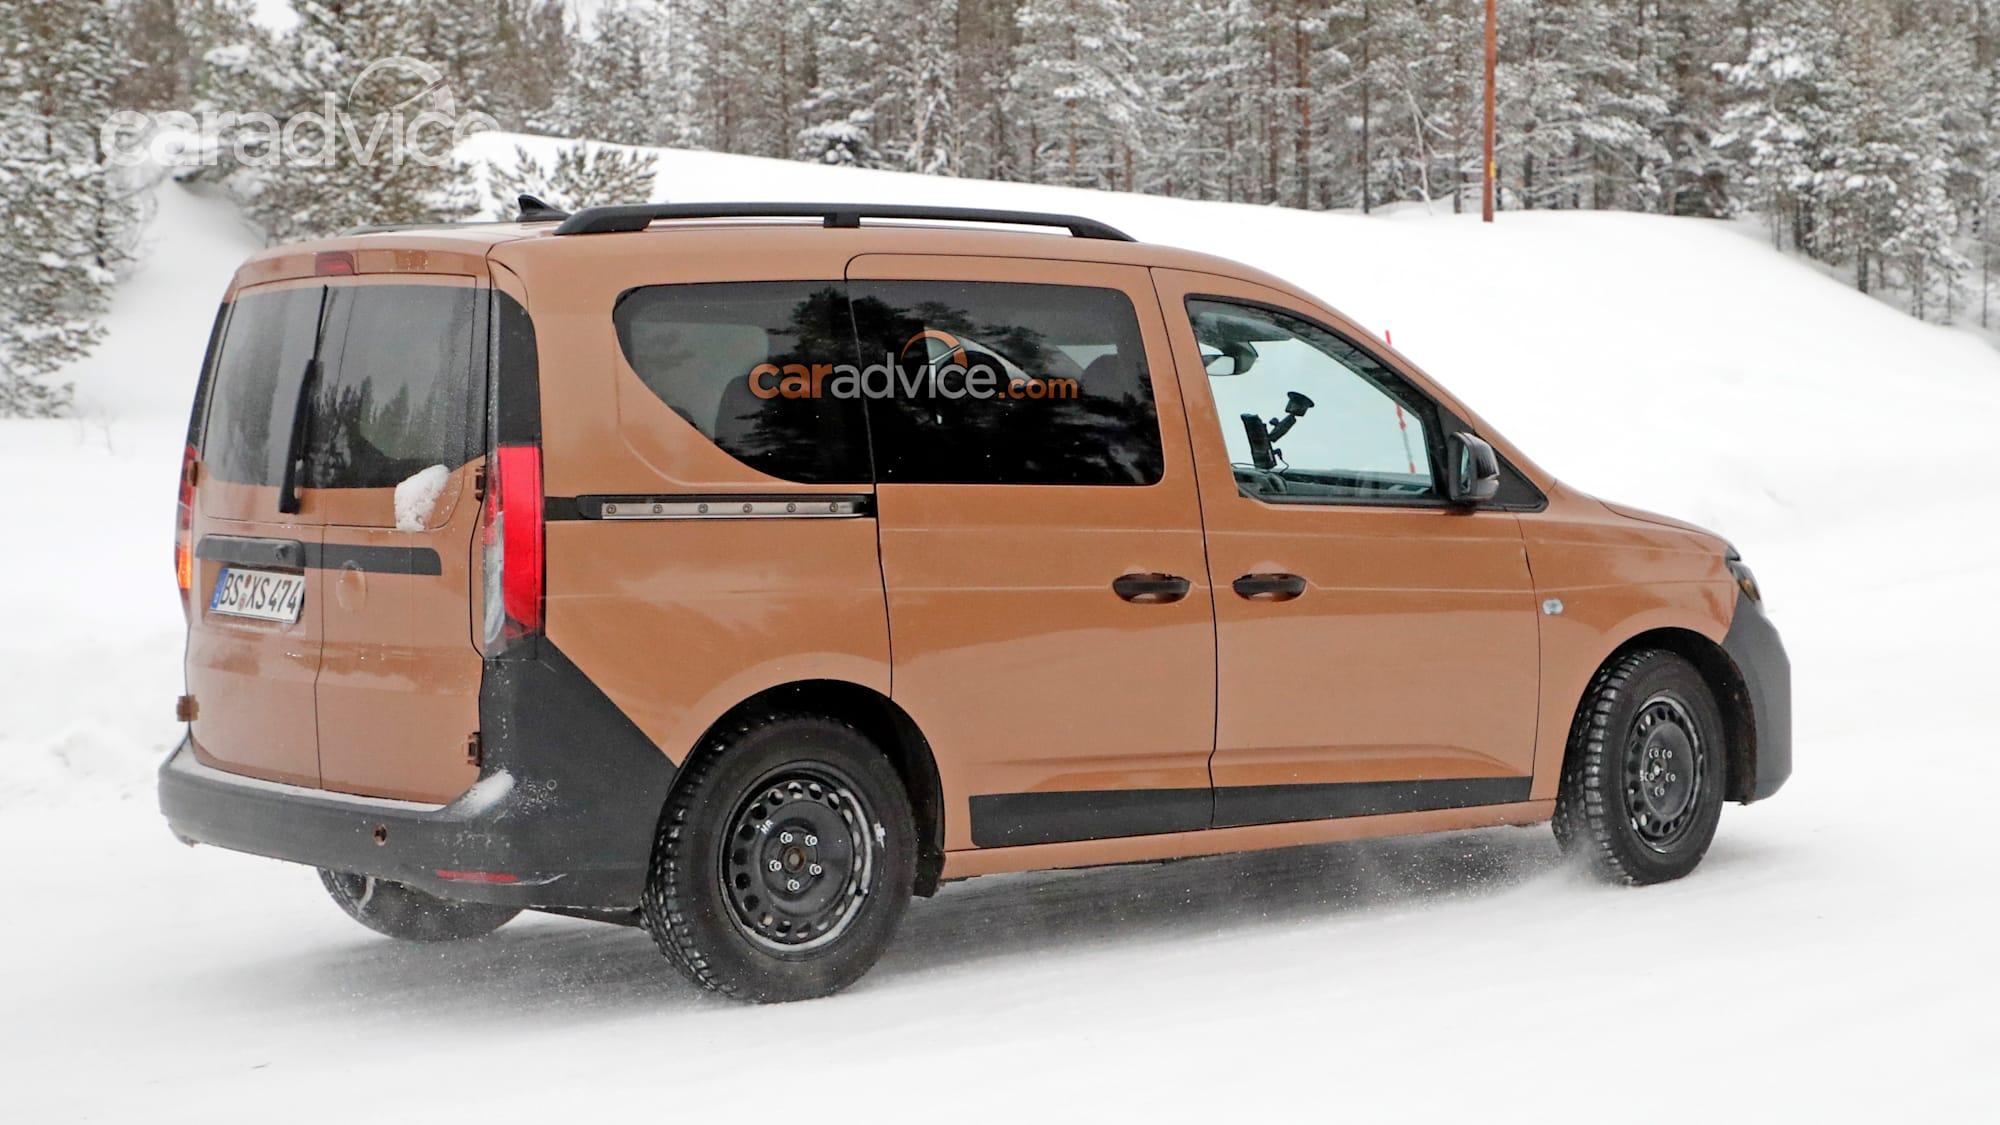 2021 Volkswagen Caddy spied   CarAdvice